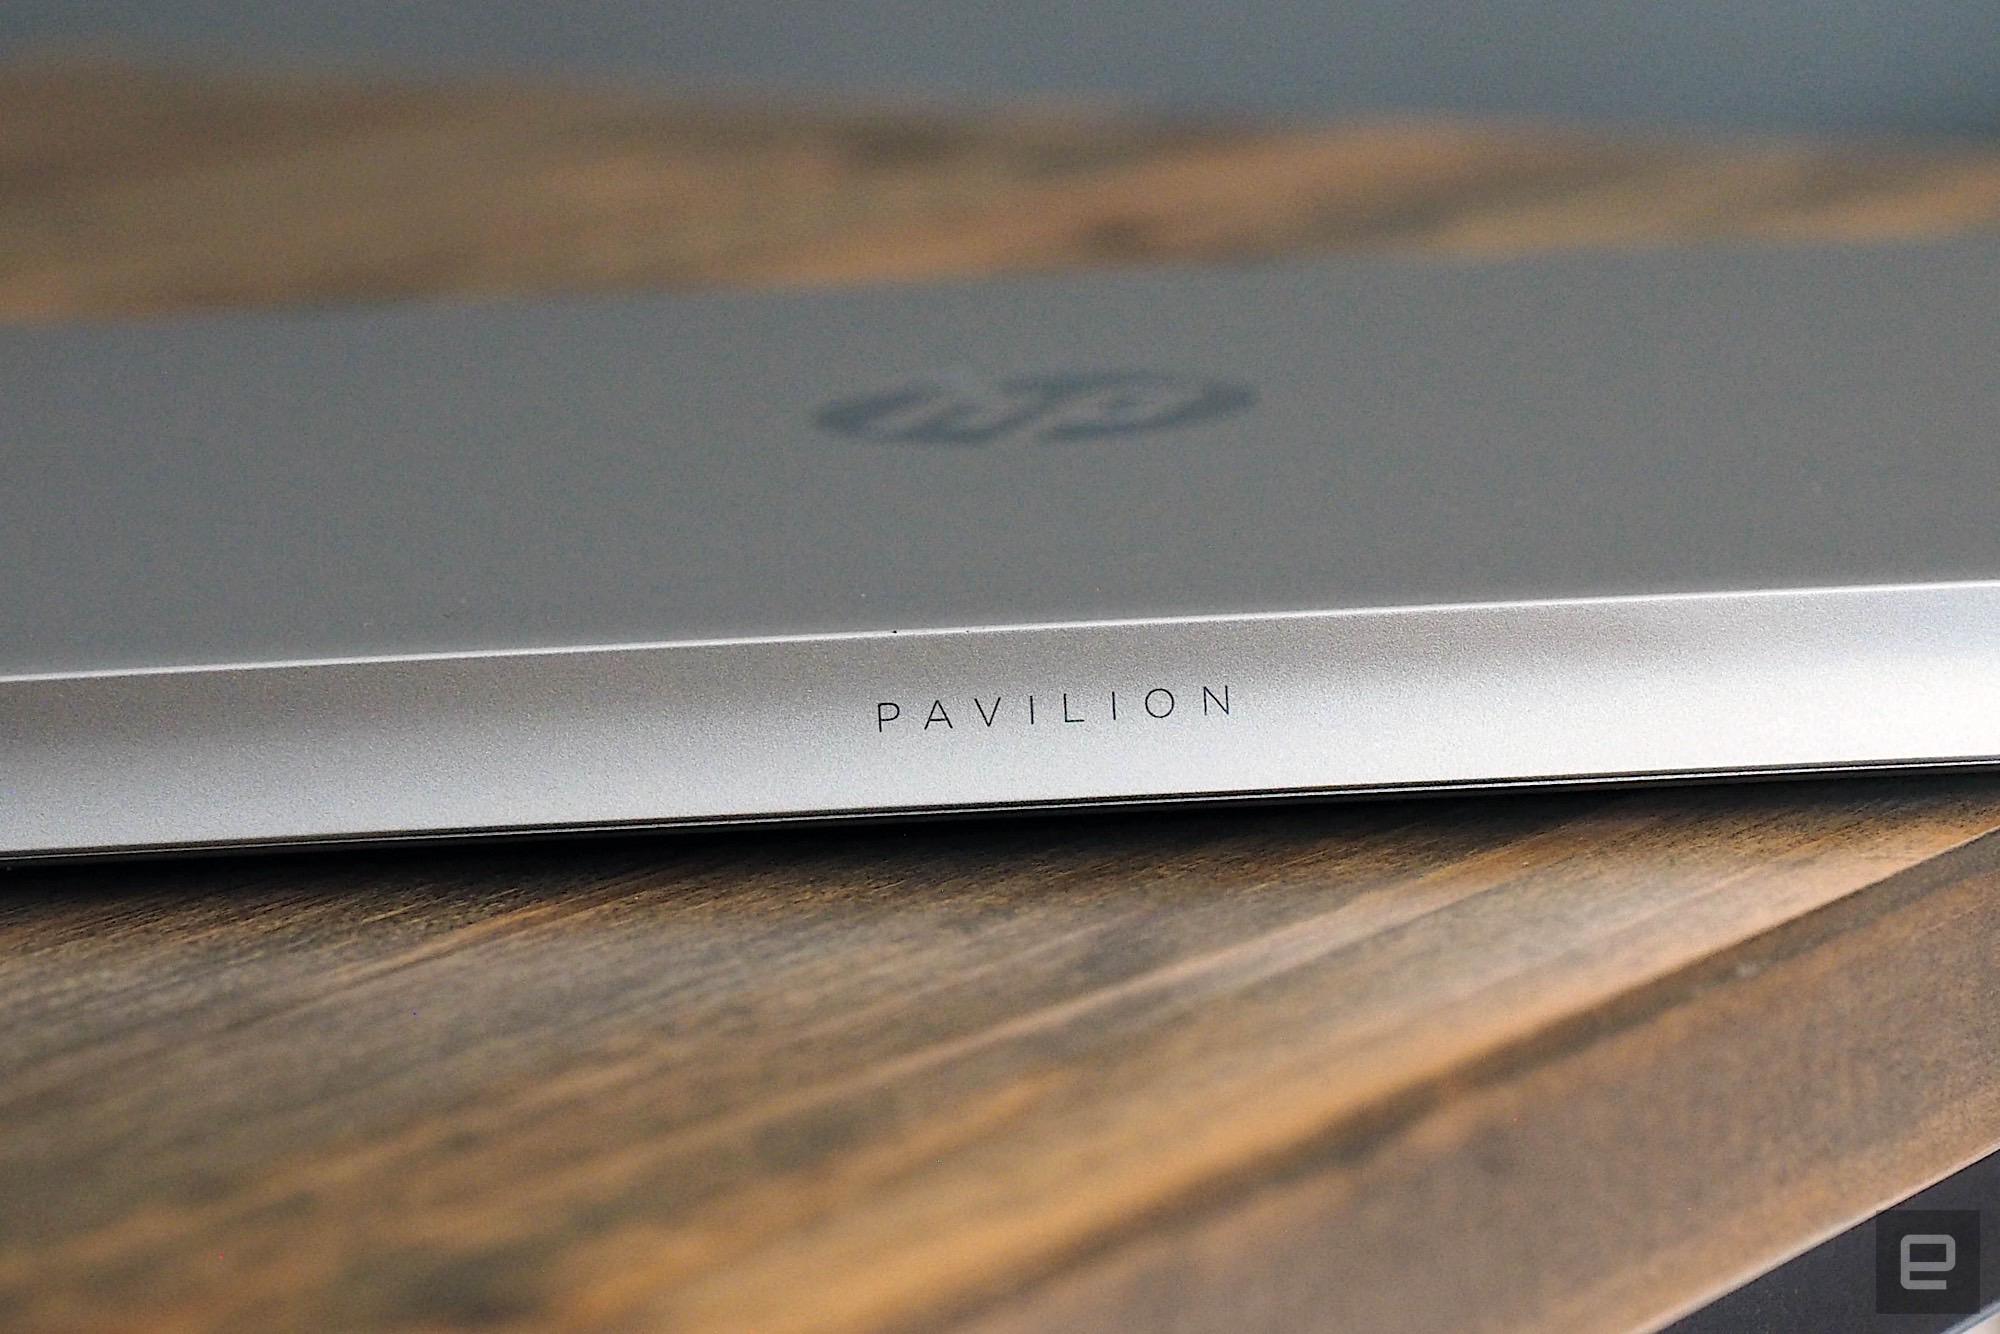 HP Pavilion 13 Aero Review